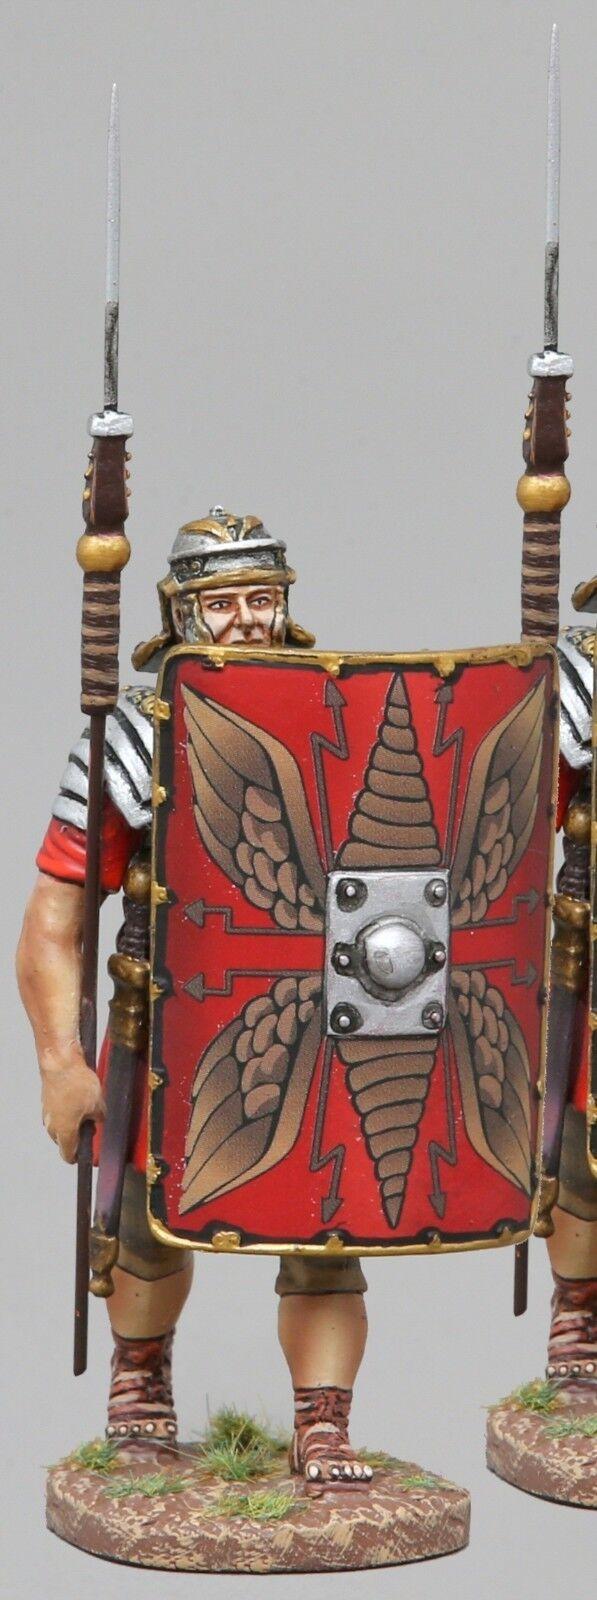 THOMAS GUNN ROMAN EMPIRE ROM005A LEGIONNAIRE WITH PILUM RAISED RED SHIELD MIB